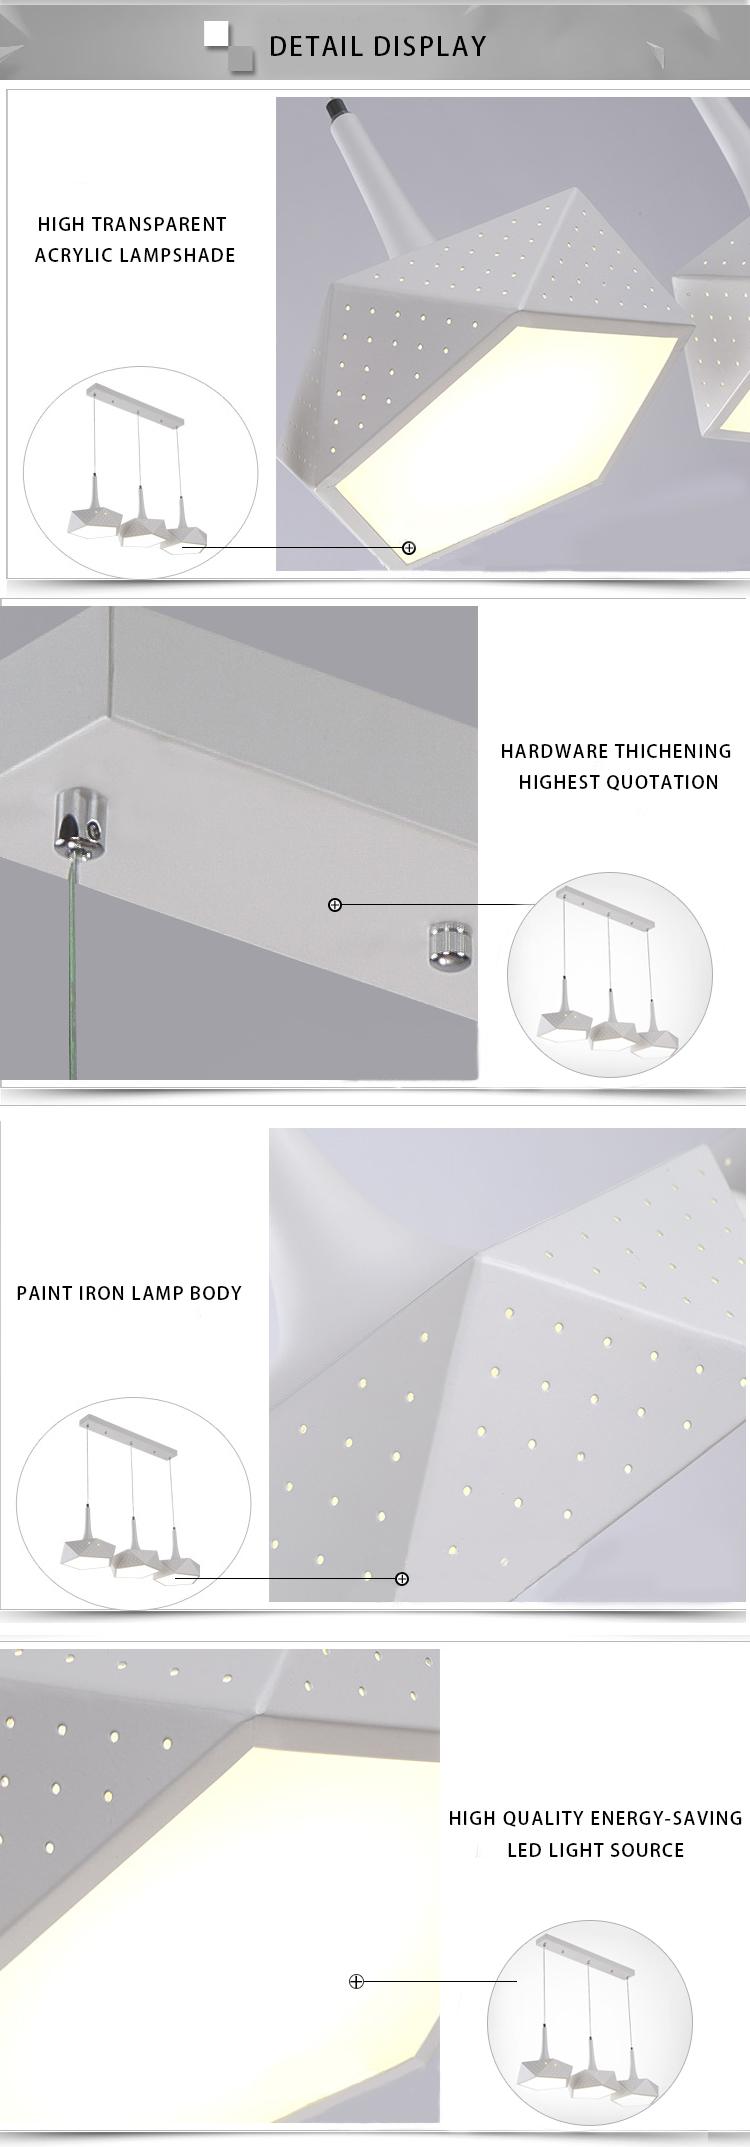 Factory Price Indoor Decorative Light LED Pendant Lighting